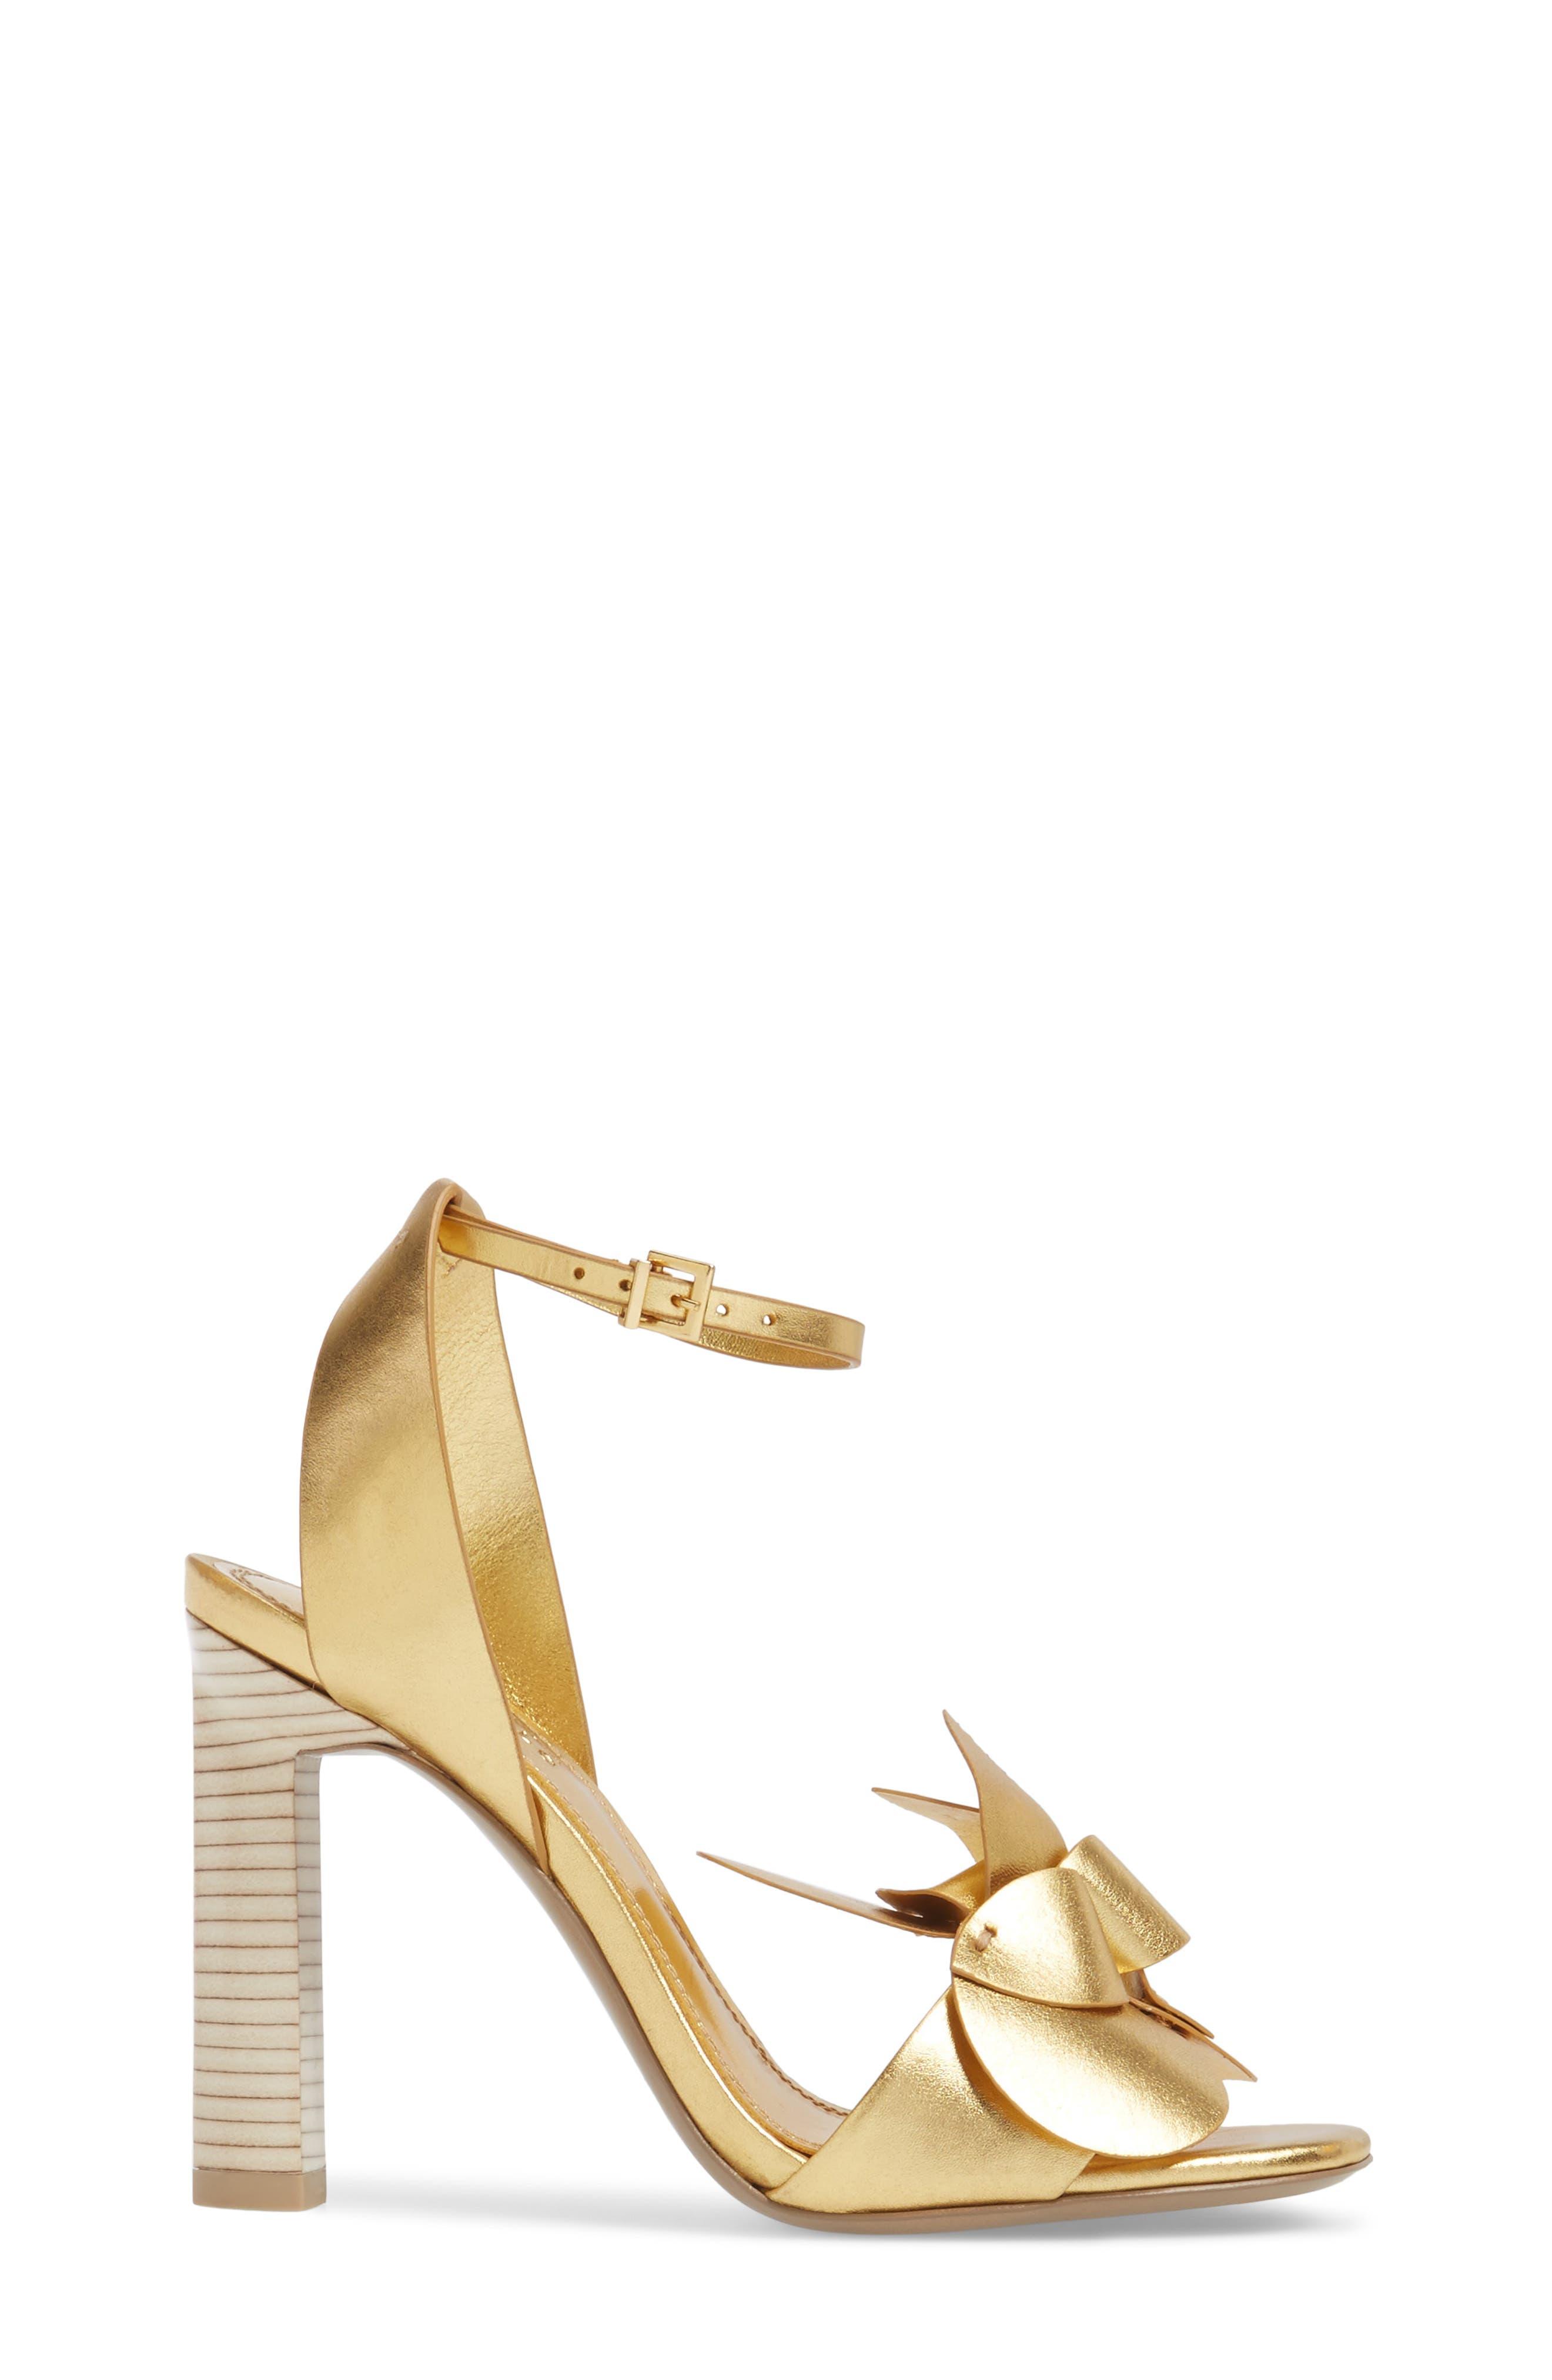 Tealia Sandal,                             Alternate thumbnail 4, color,                             Gold Leather